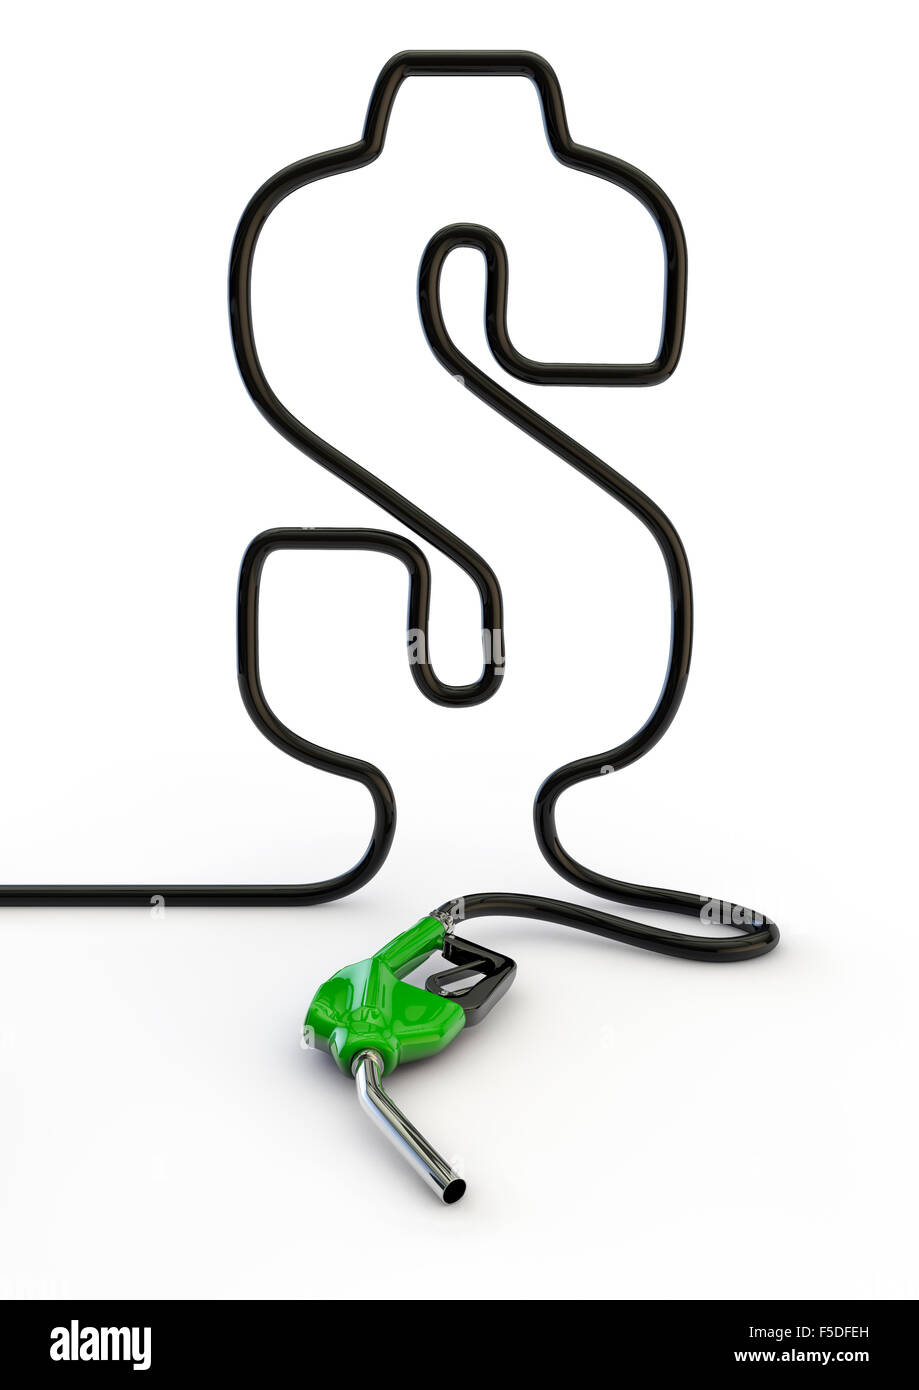 Dollar hose / 3D render of petrol hose forming dollar symbol - Stock Image